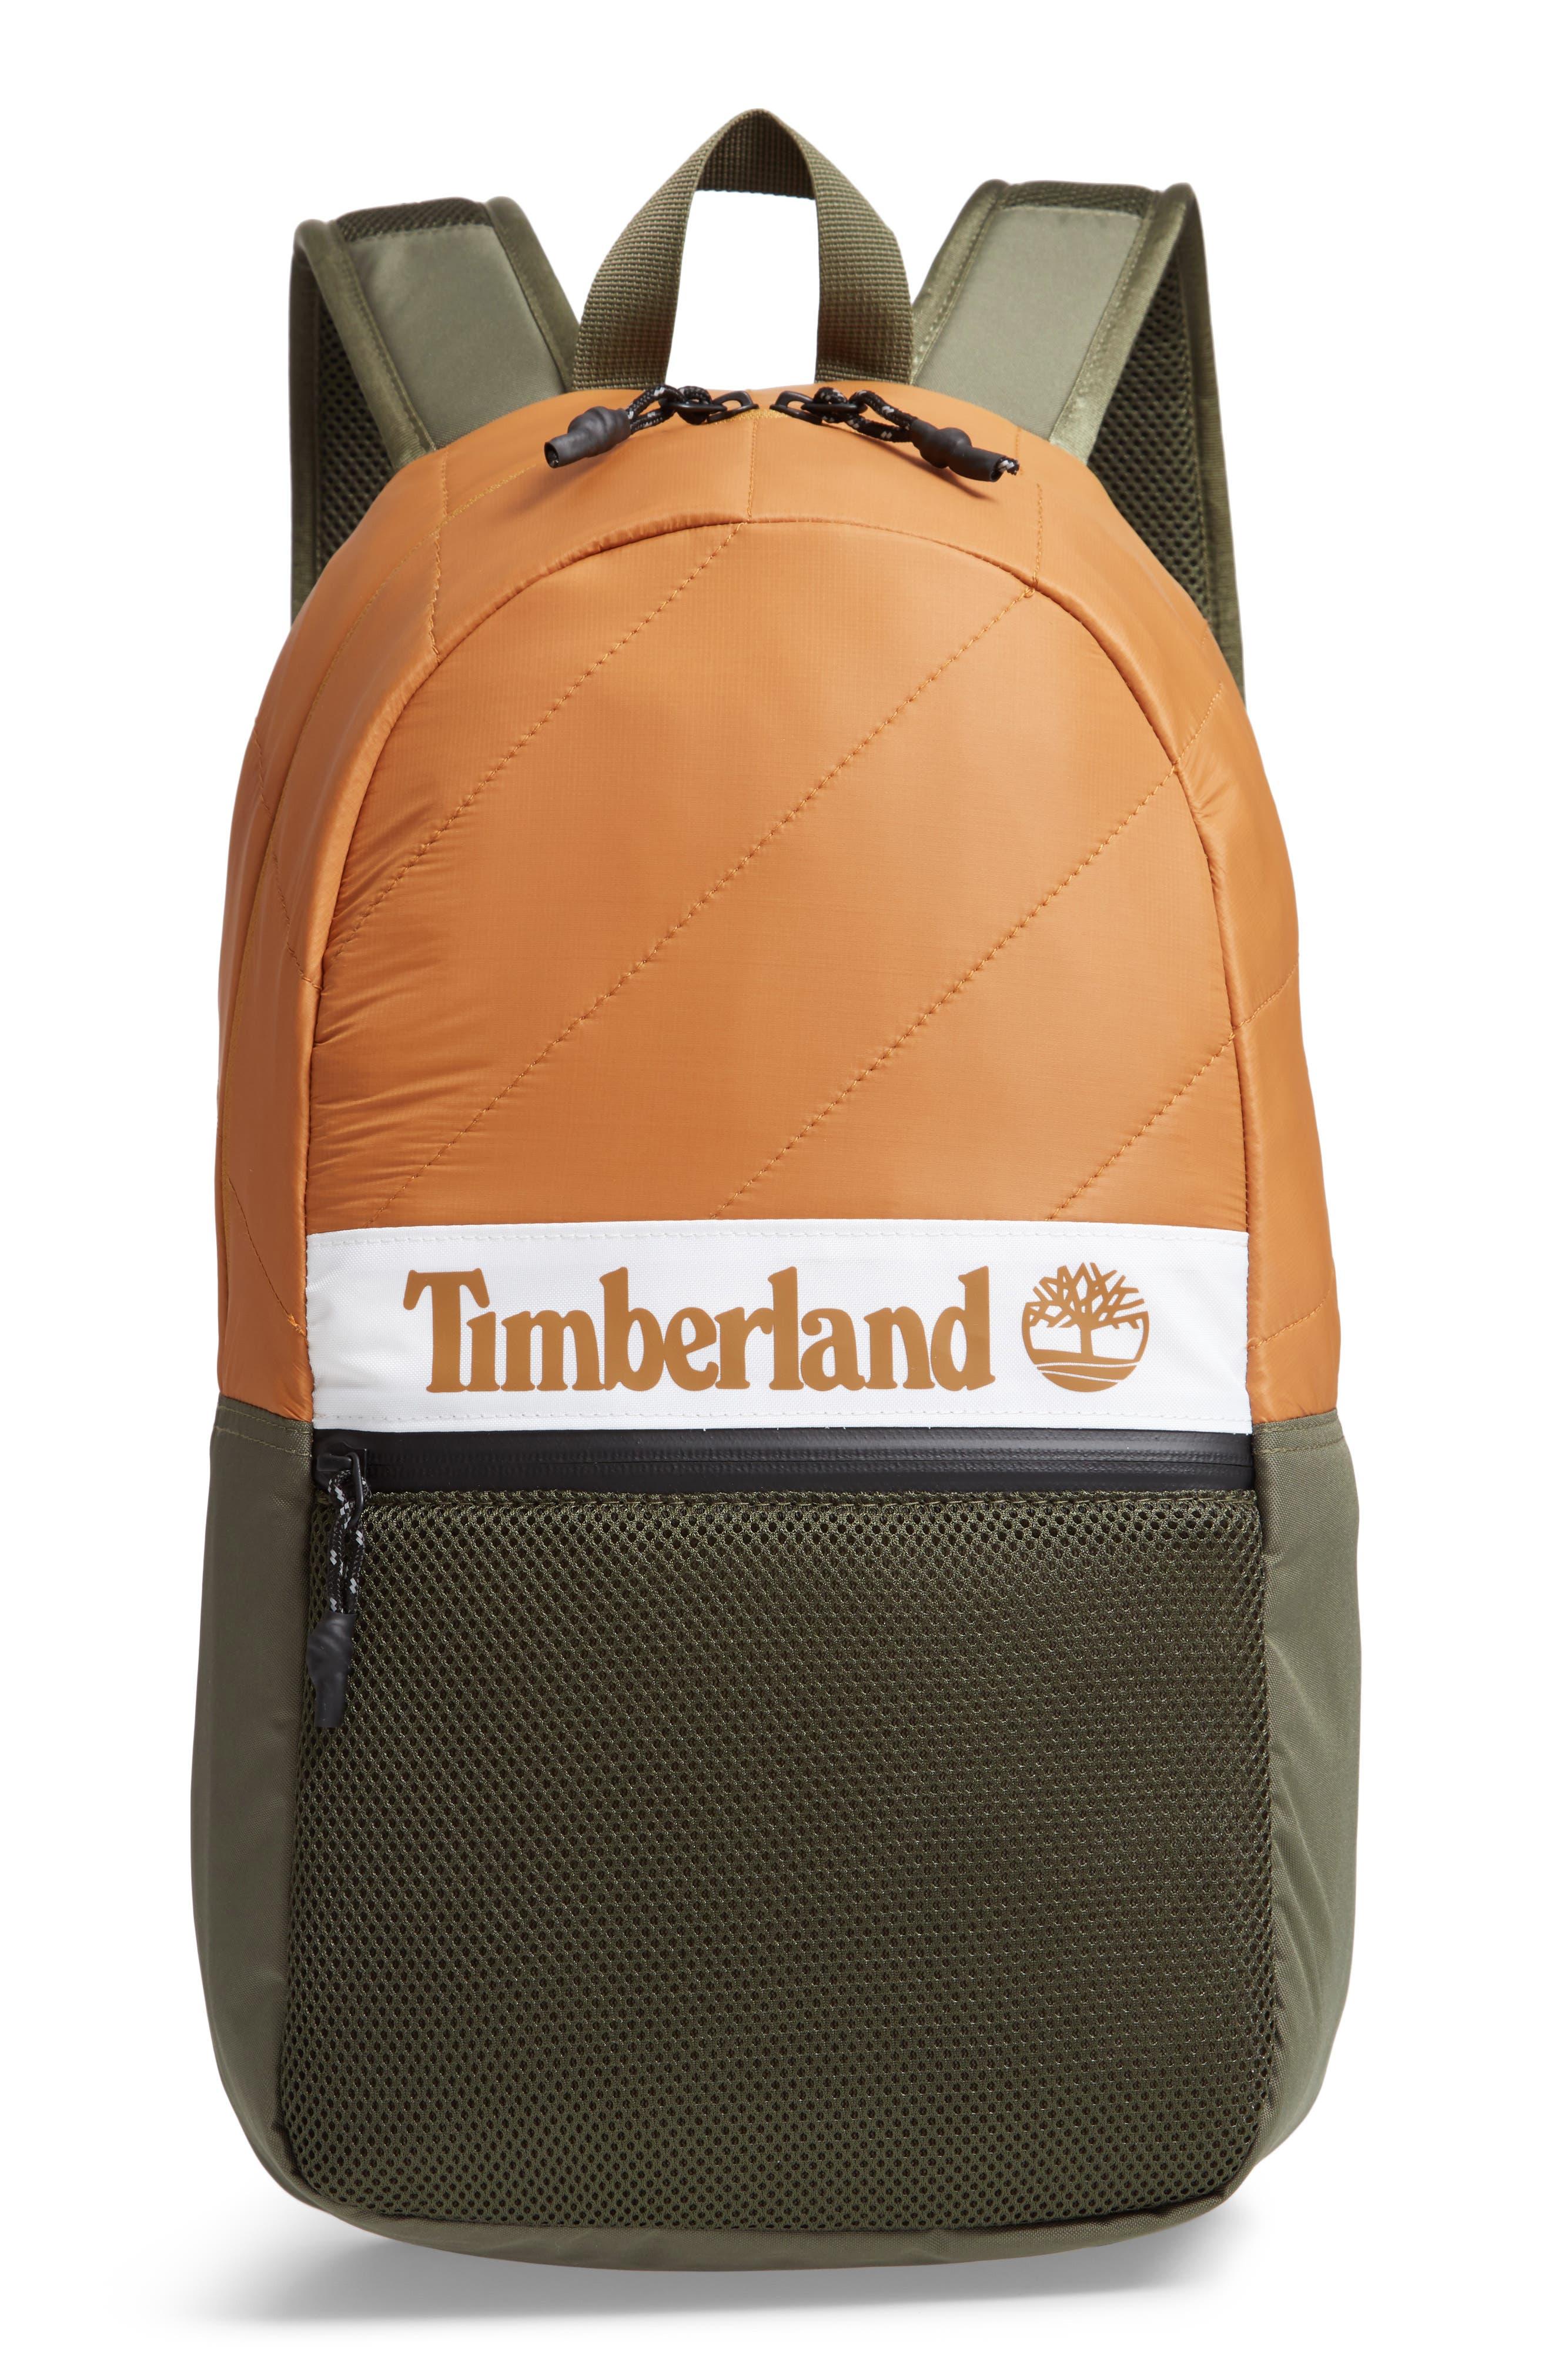 Timberland Classic Backpack - Beige